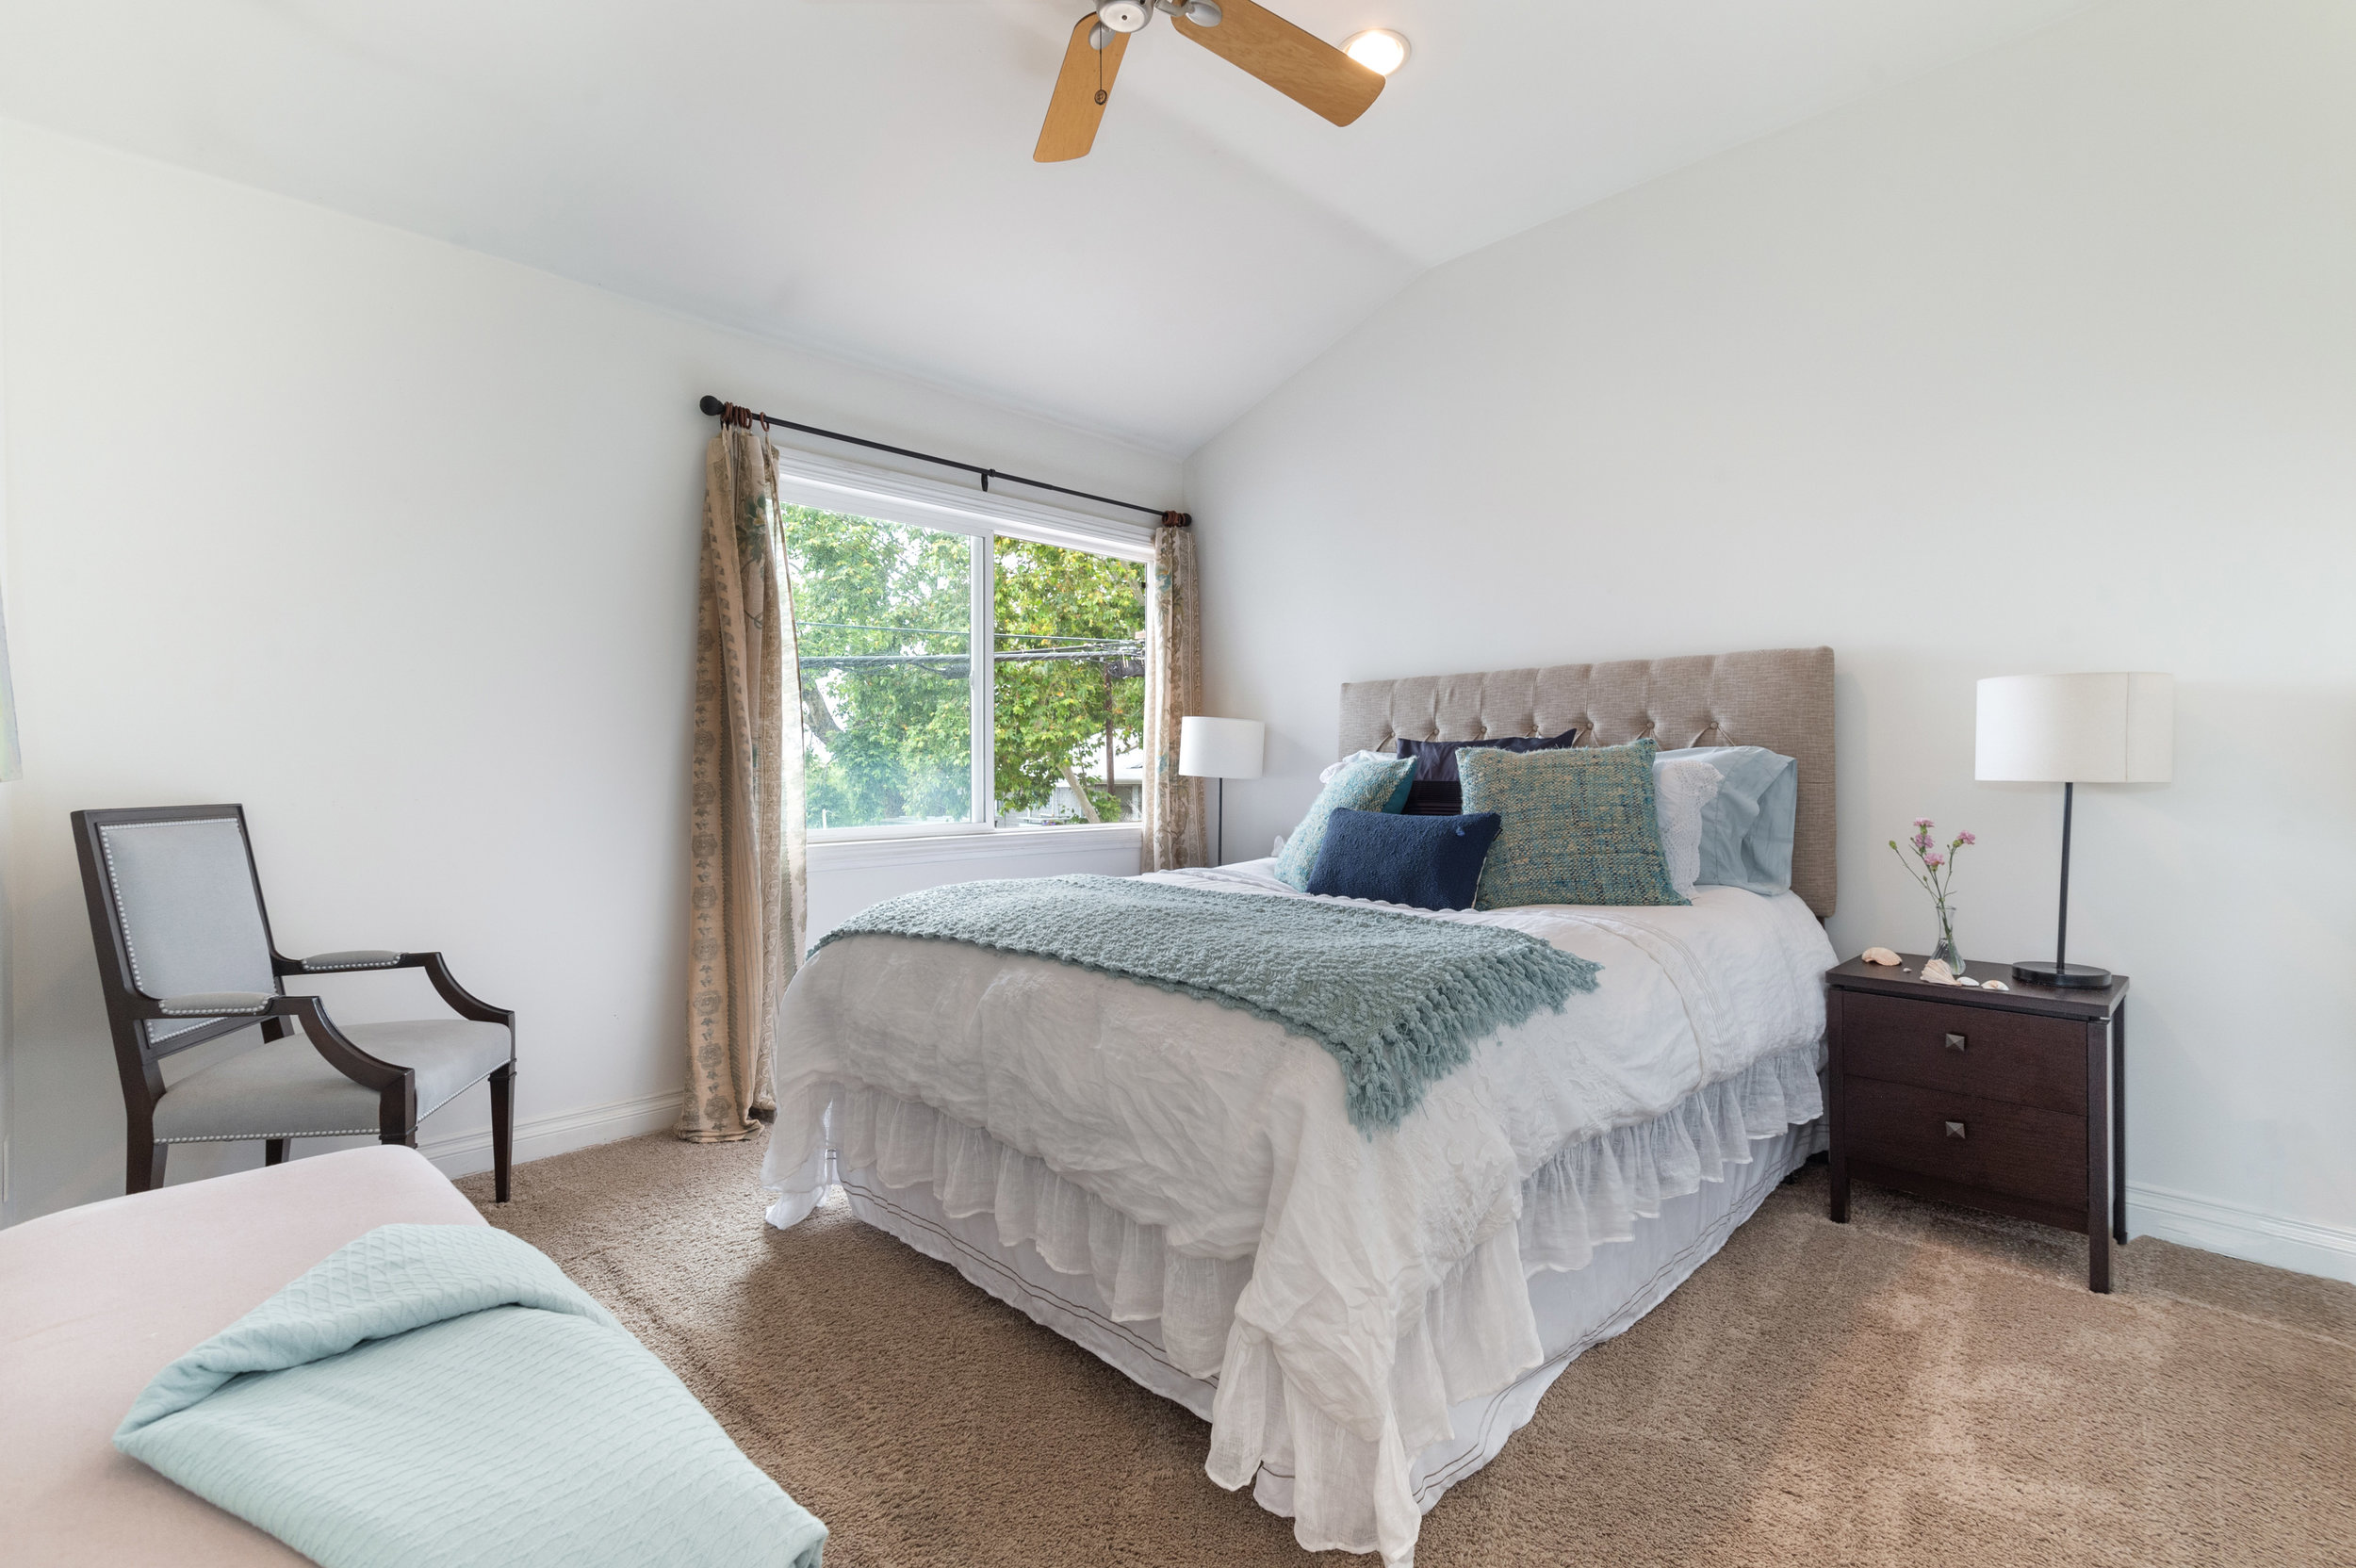 011 Bedroom 3952 Las Flores For Sale Lease The Malibu Life Team Luxury Real Estate.jpg